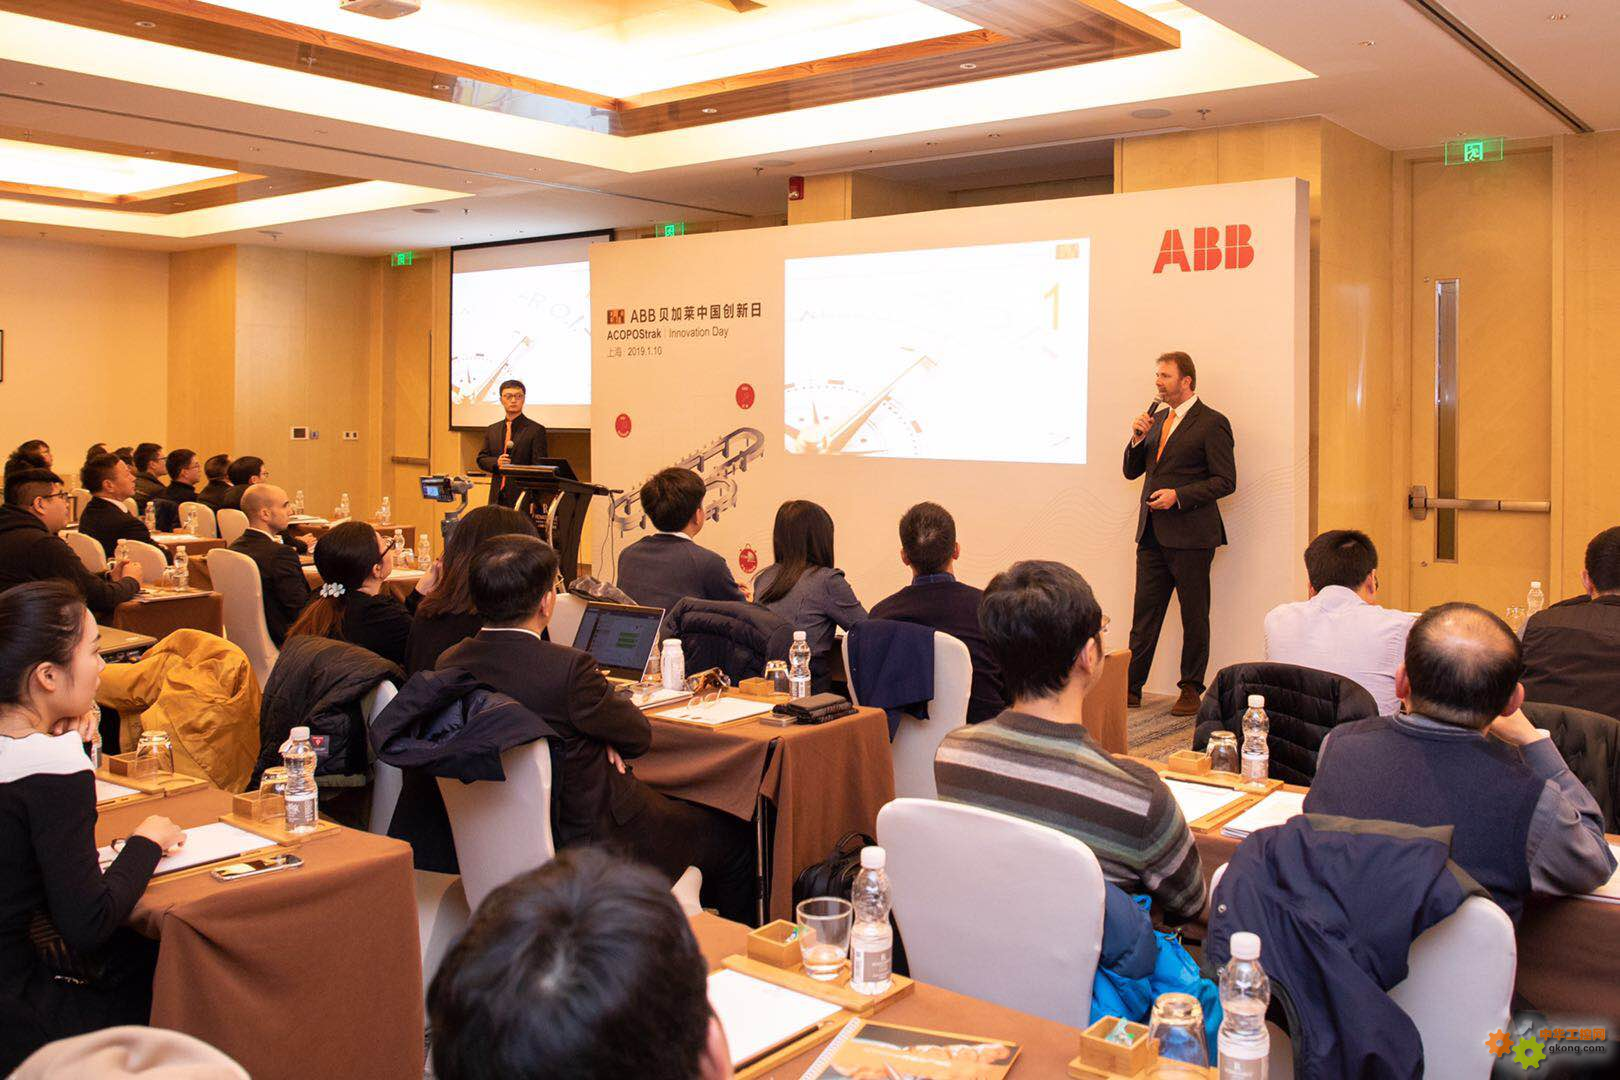 3 ABB贝加莱中国创新日现场图